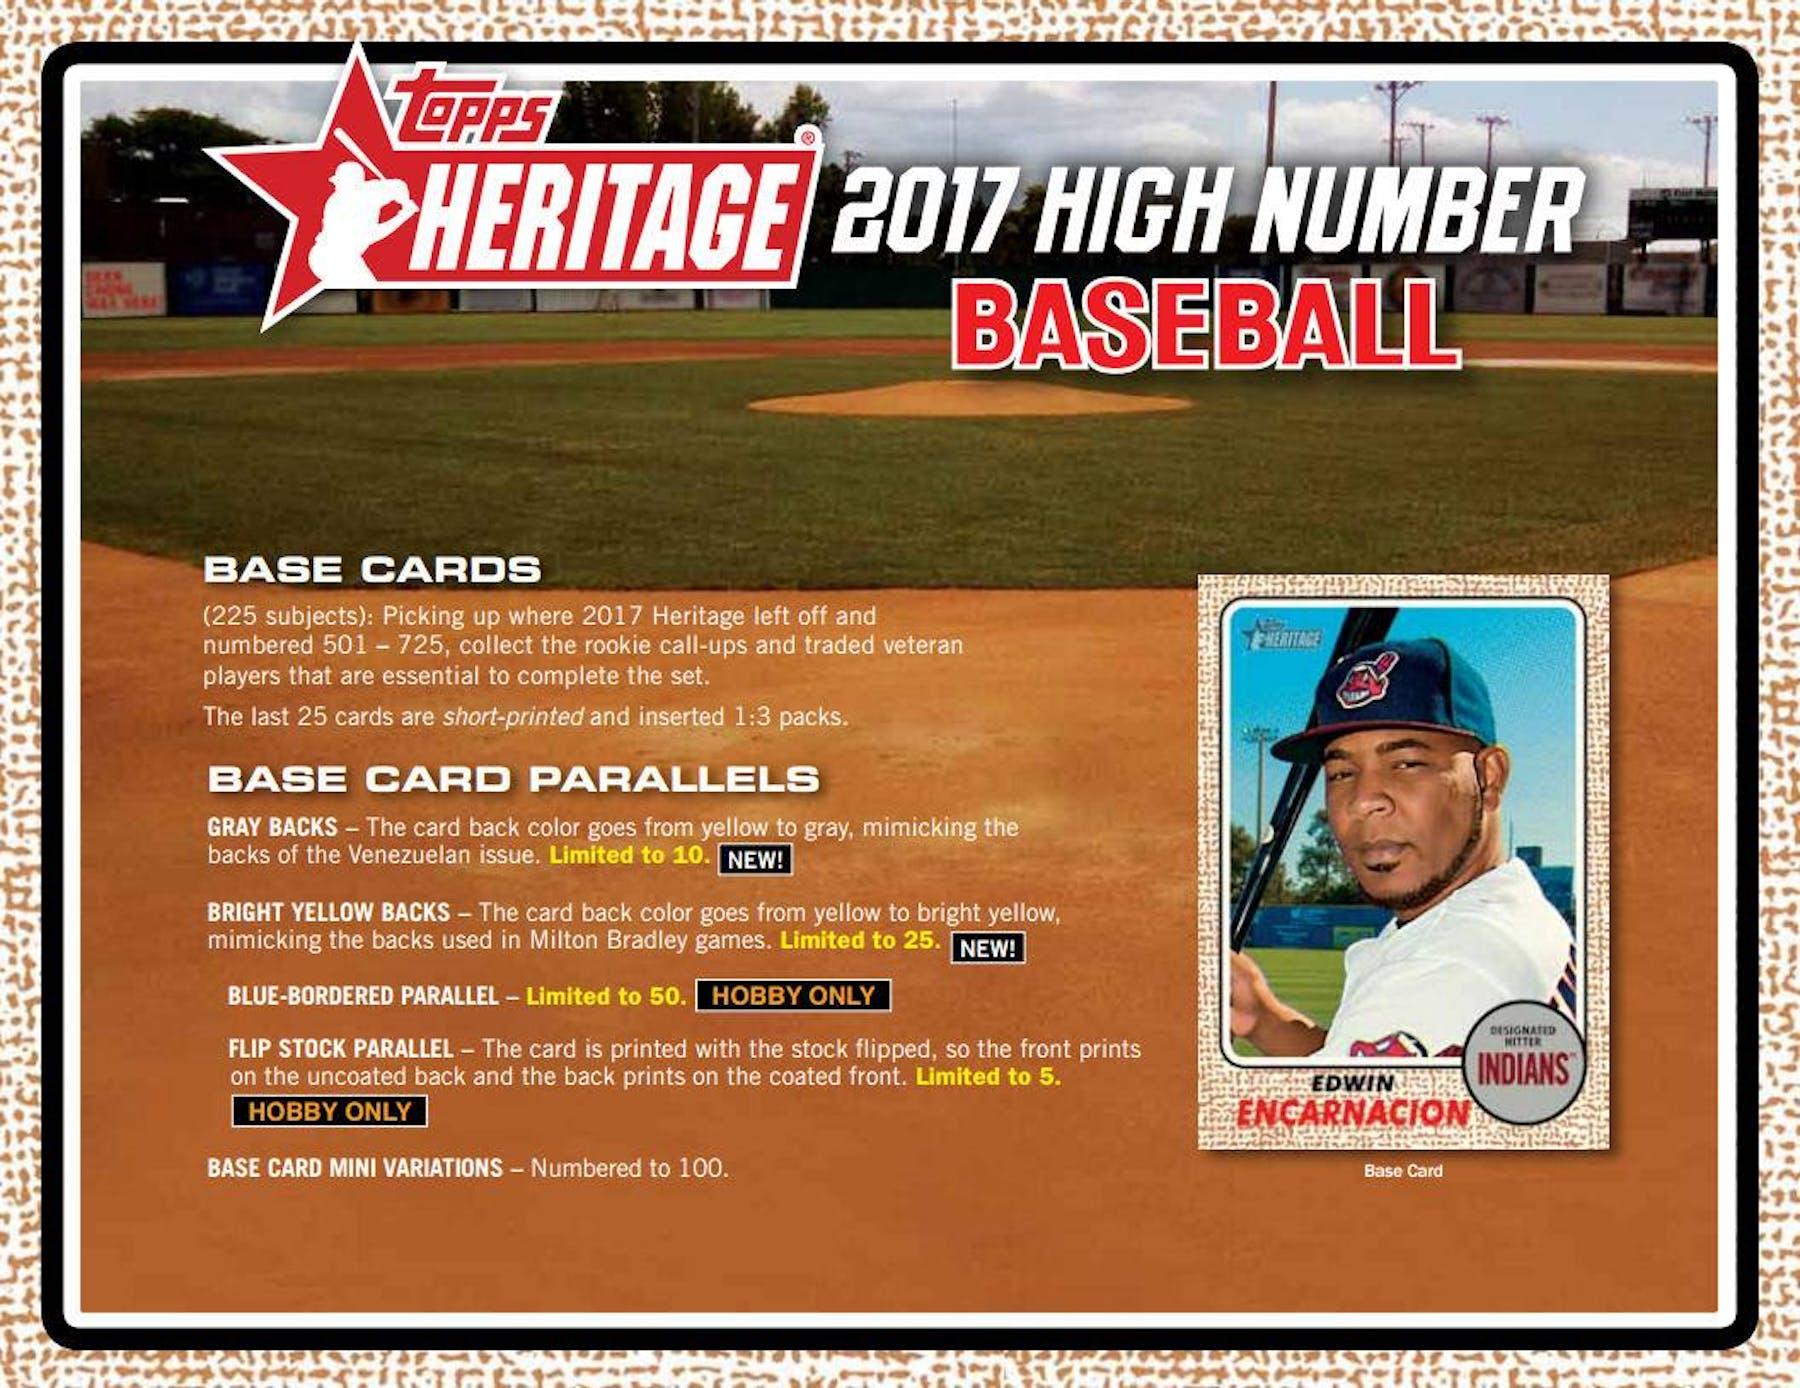 2017 Topps Heritage High Number Baseball Hobby Box Da Card